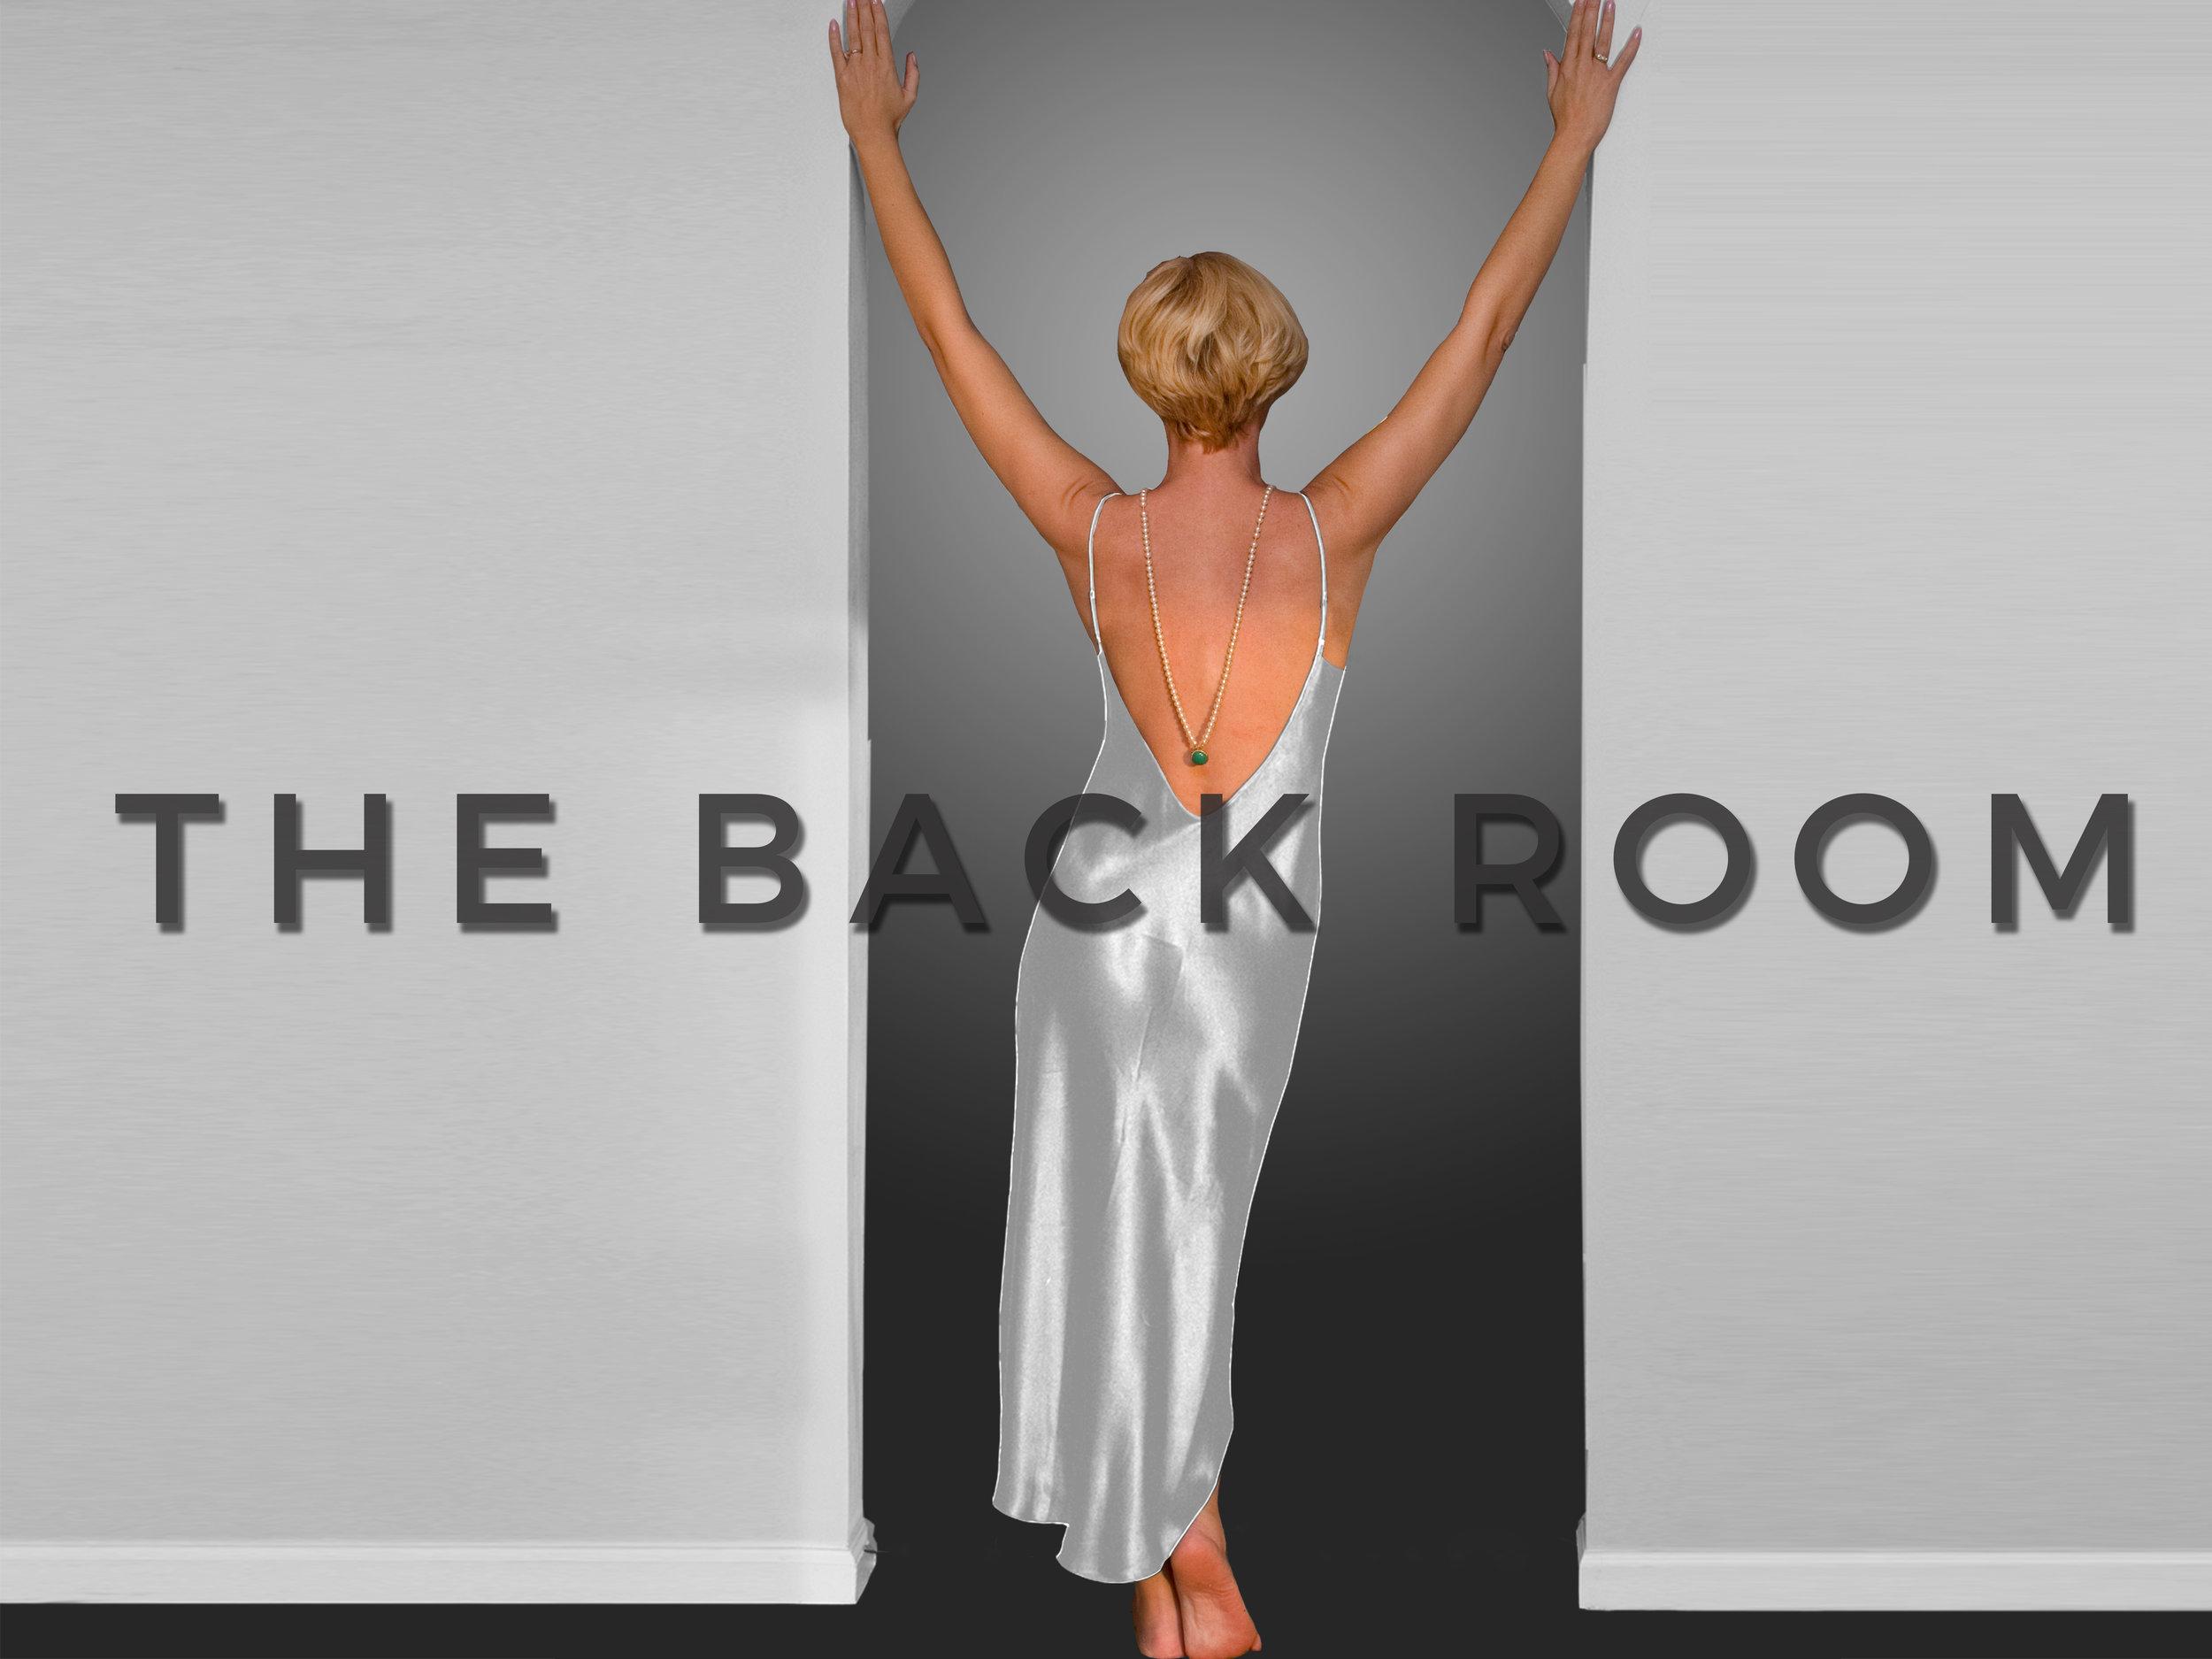 The Back Room Full Size - POR w skin.jpg